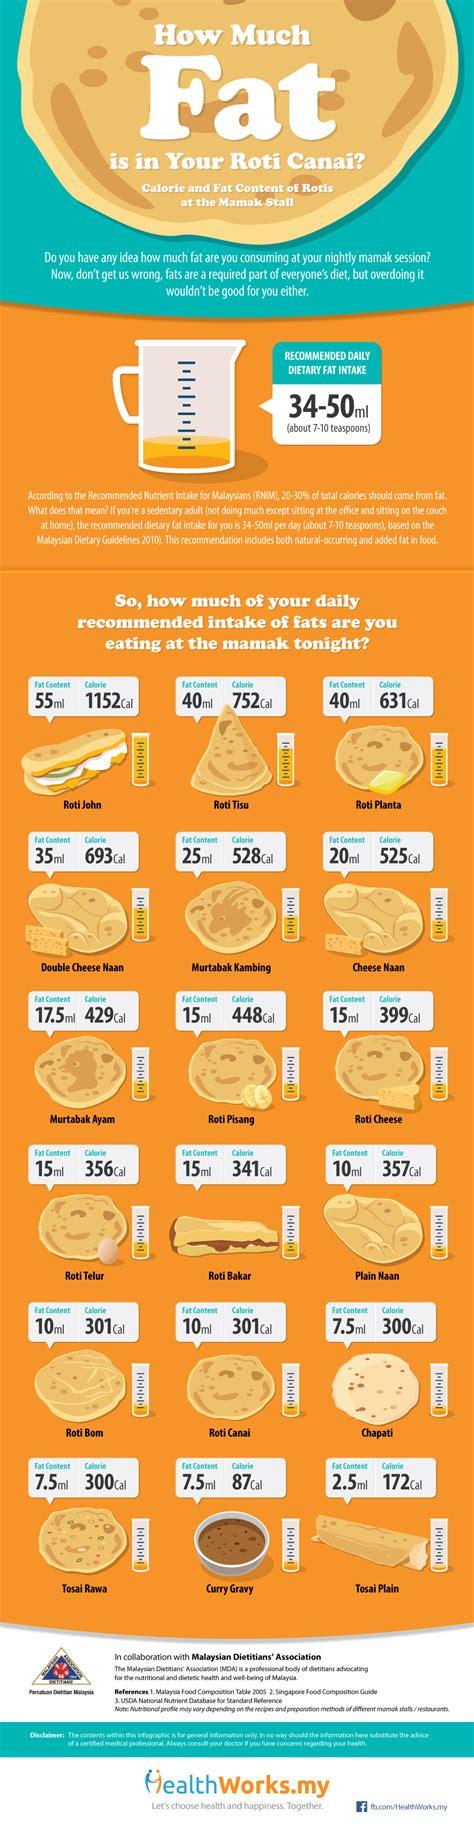 infographic   fat    roti canai calories